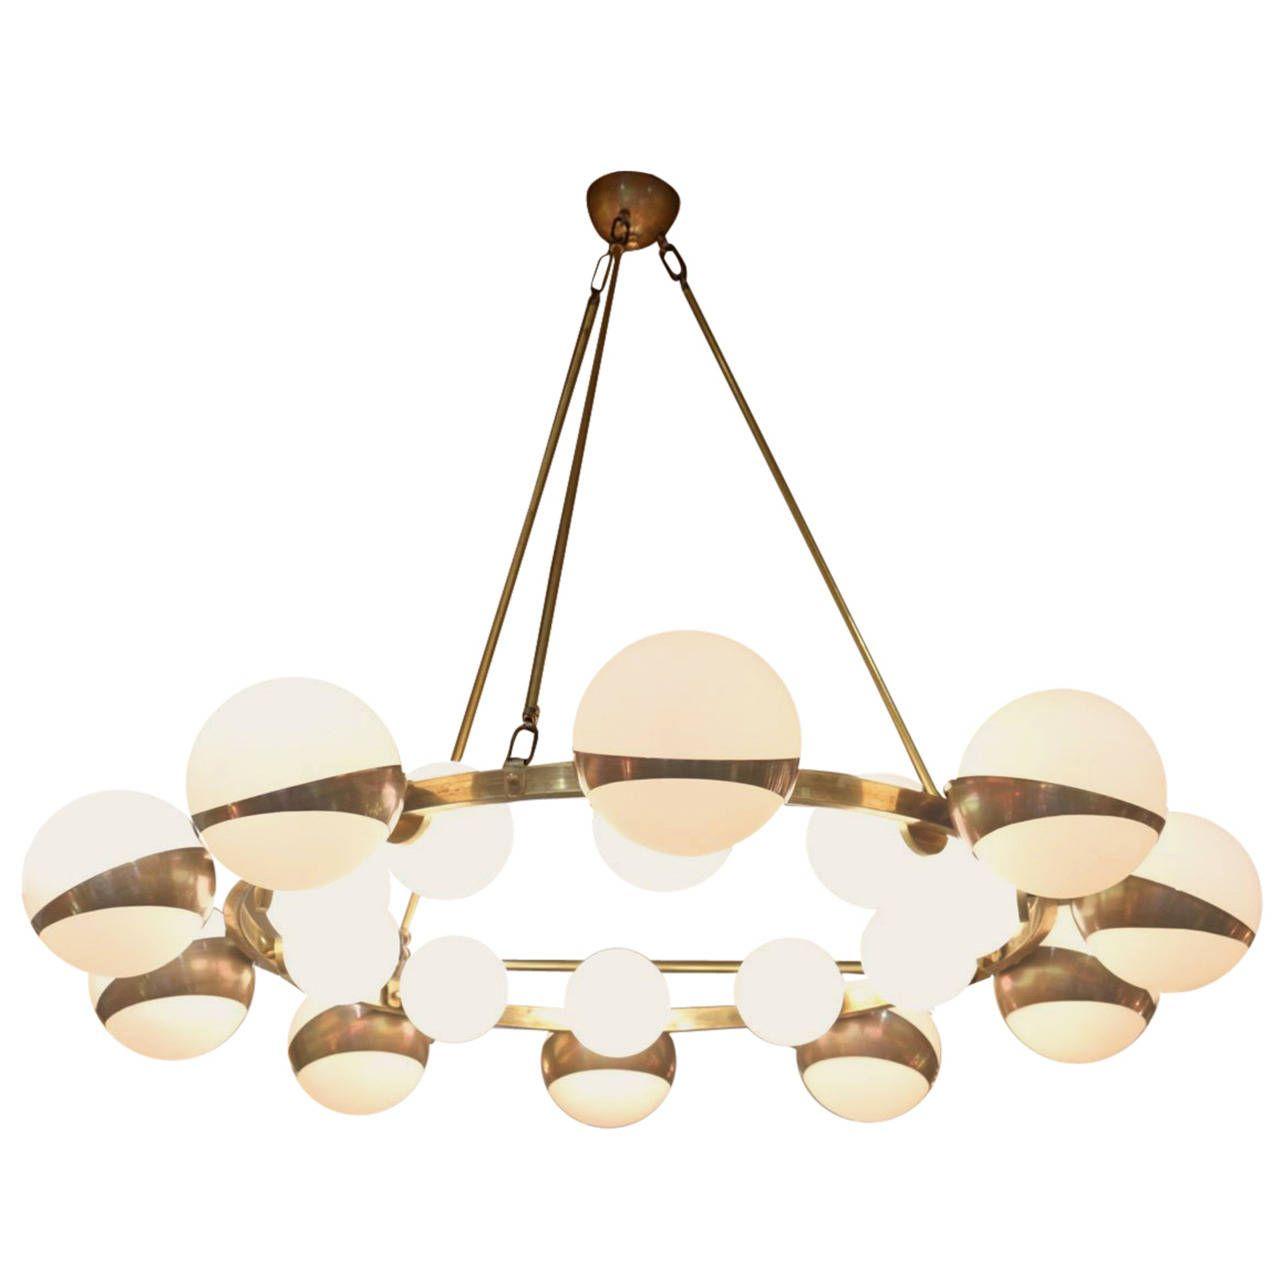 1970s hans agne jakobsson smoked globes and brass light fixture large 1950s chandelier attr to maison stilnovo aloadofball Gallery